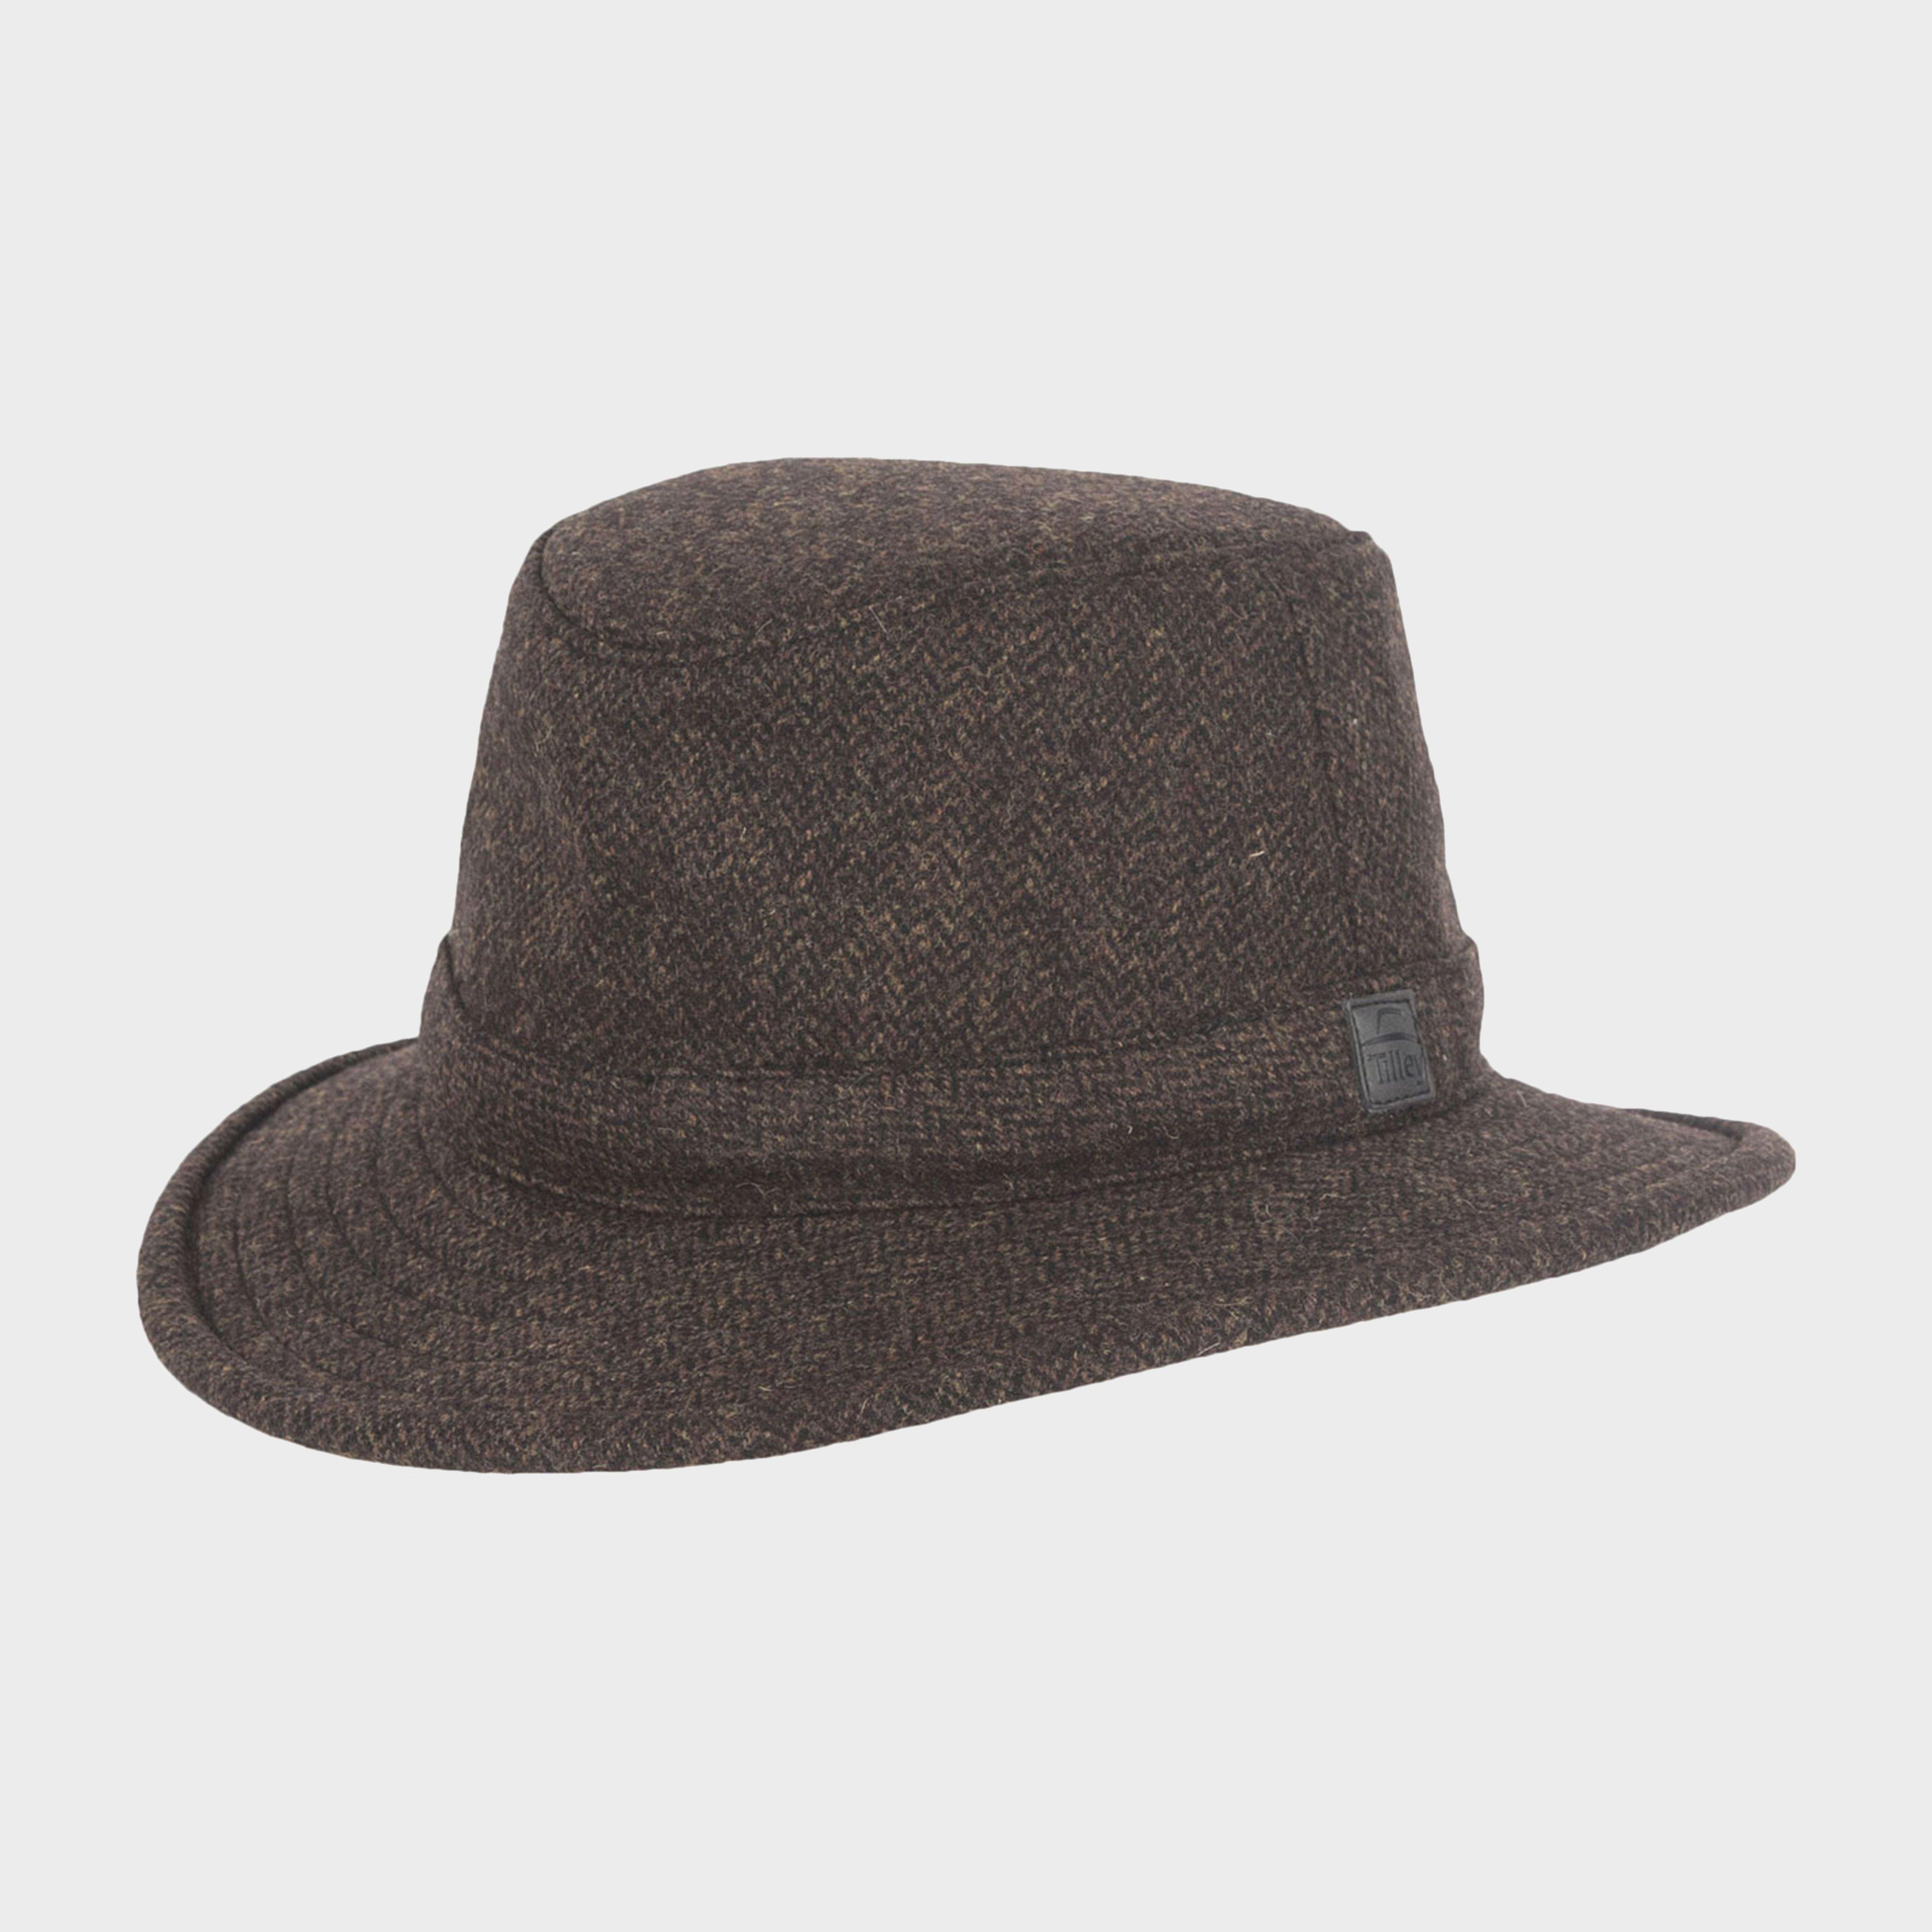 Tilley Tilley TTW2 Tec-Wool Hat